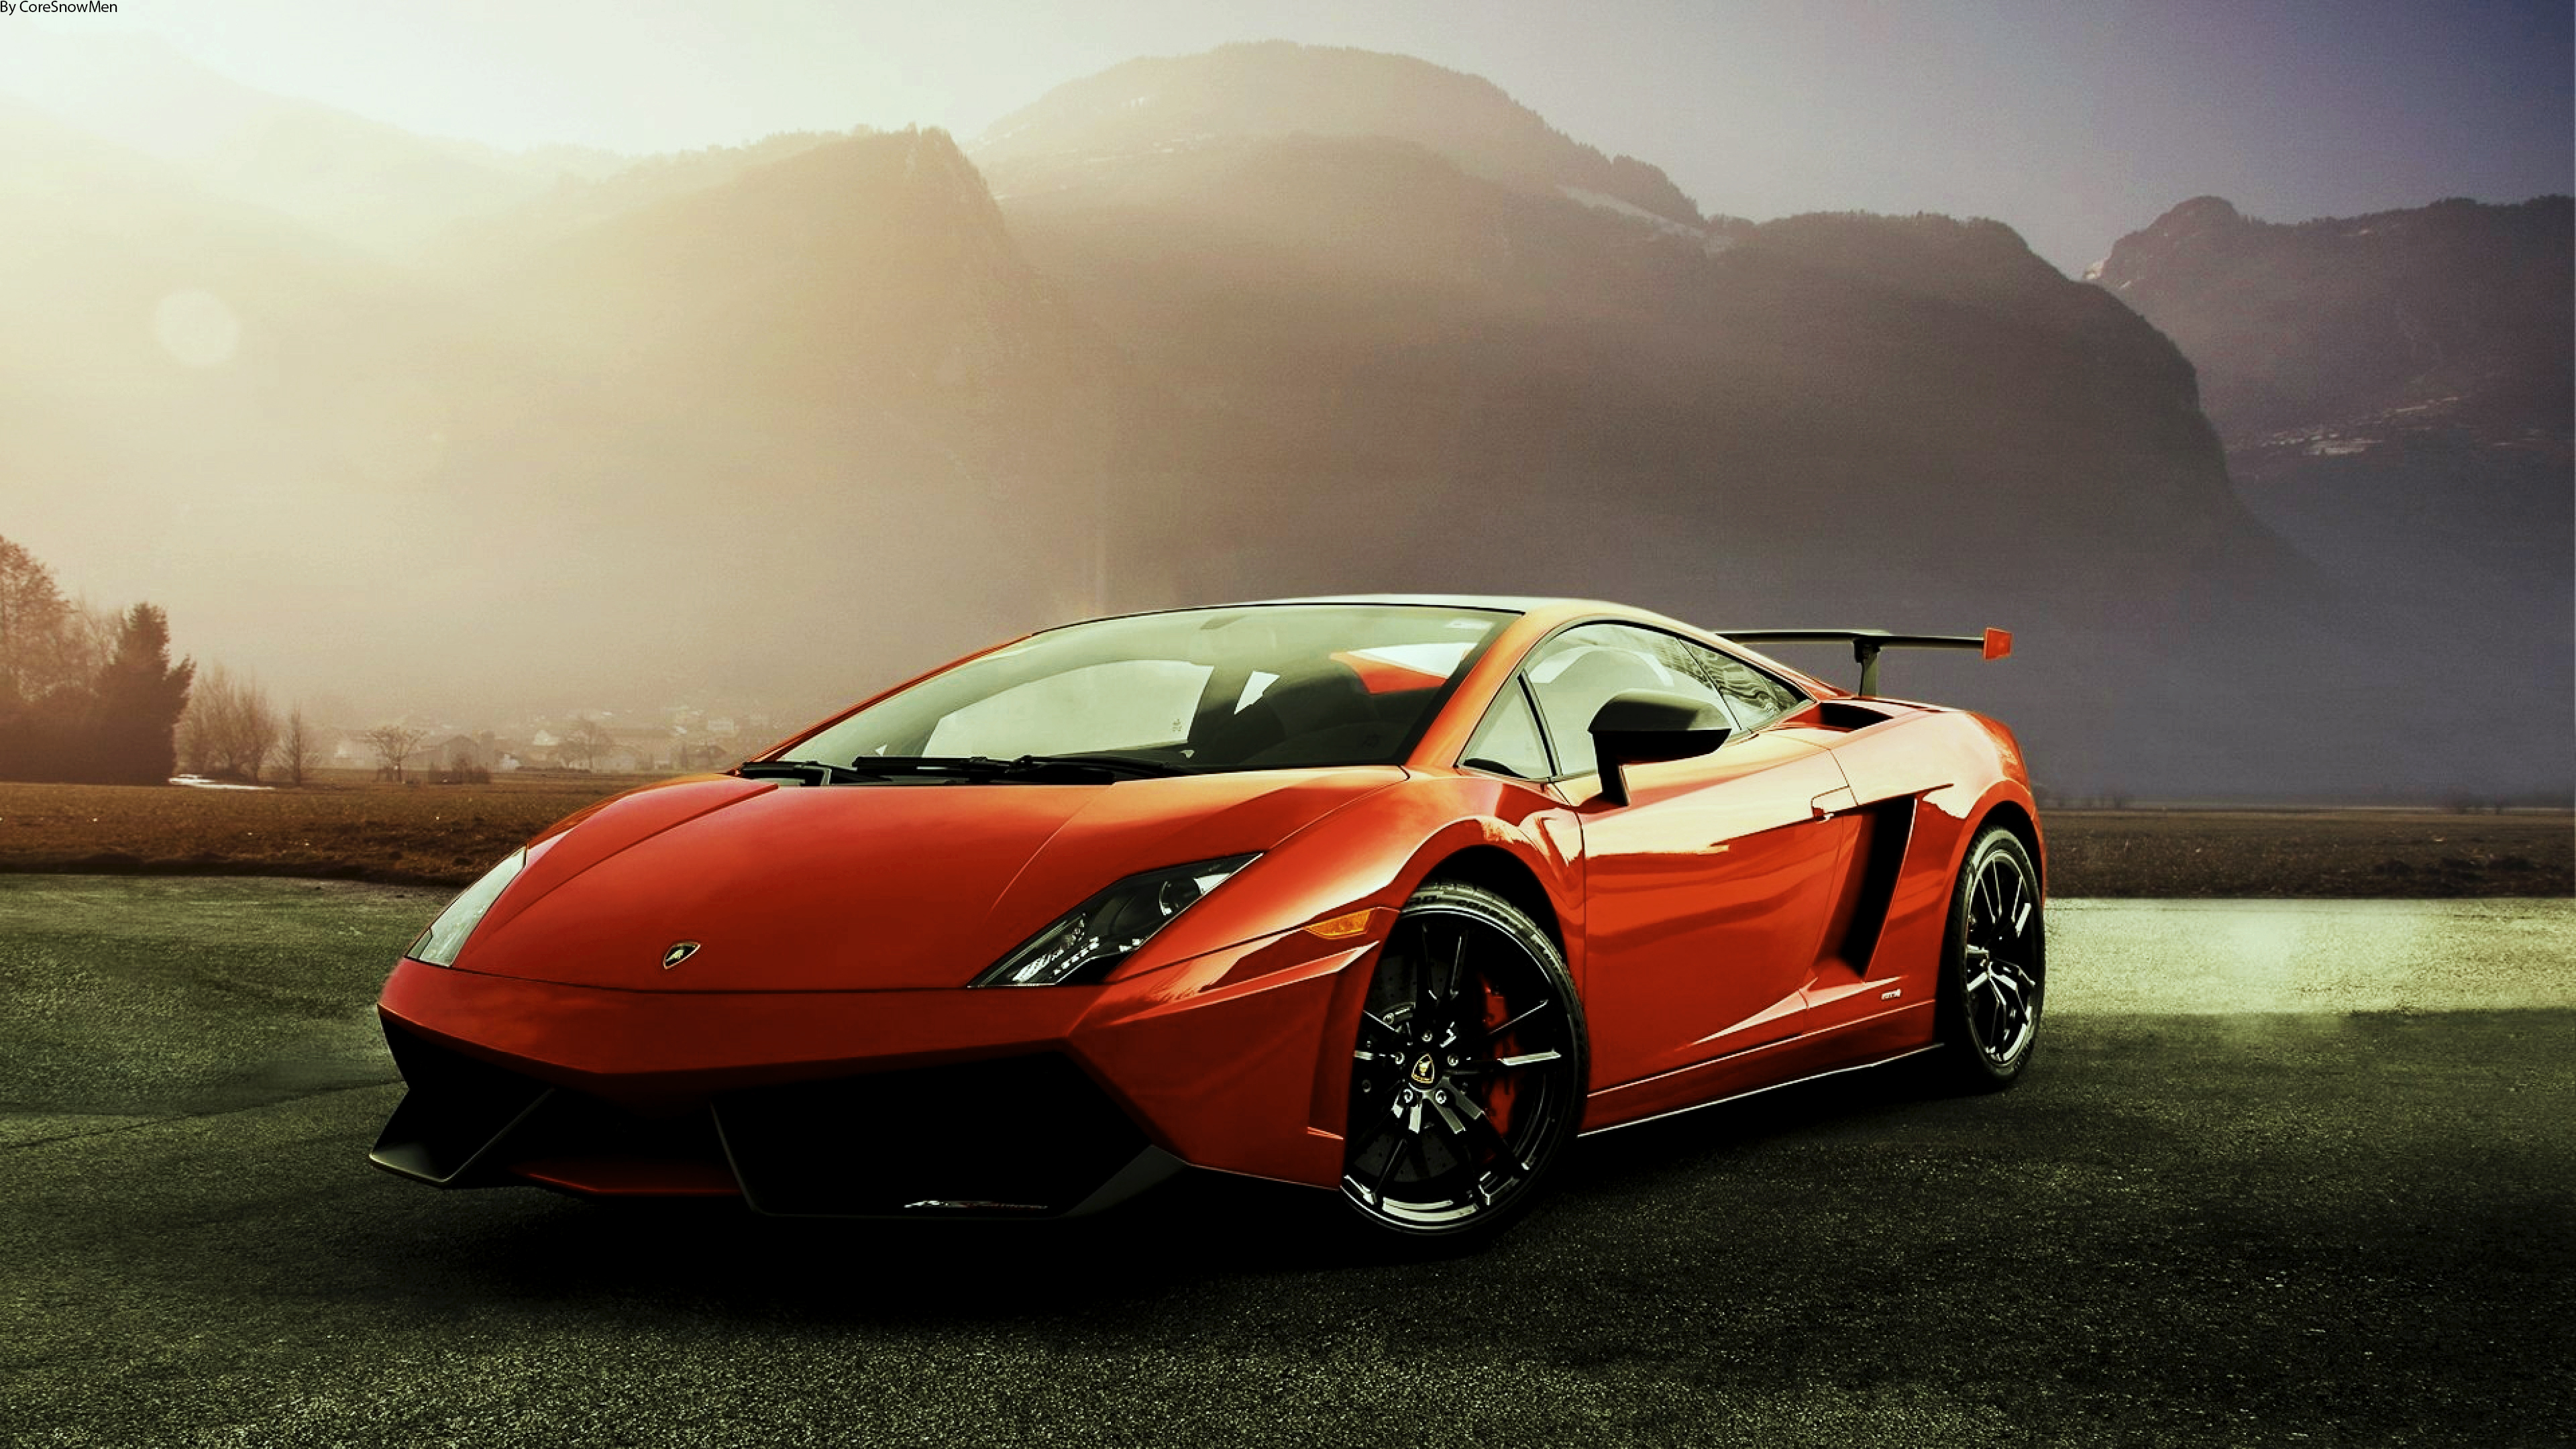 Cool Cars Wallpaper For Mobile 87 Lamborghini Gallardo Hd Wallpapers Backgrounds